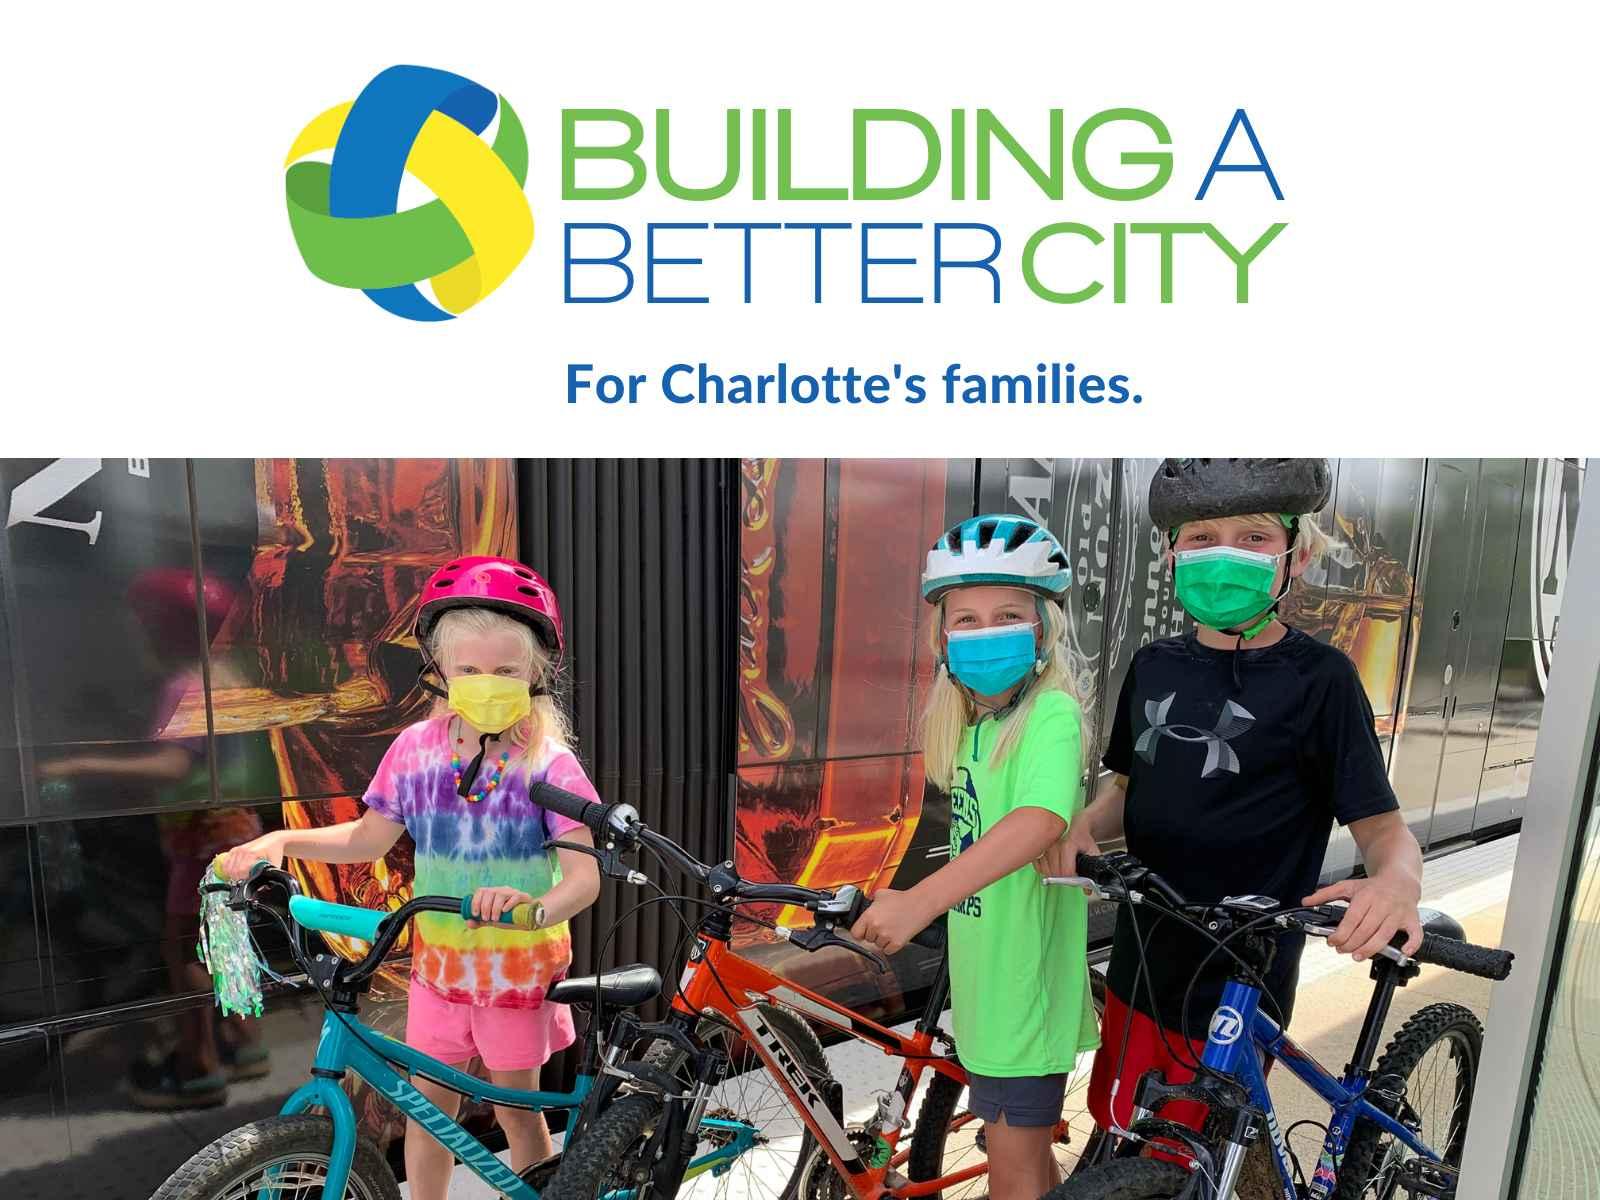 kids_with_bikes.jpg